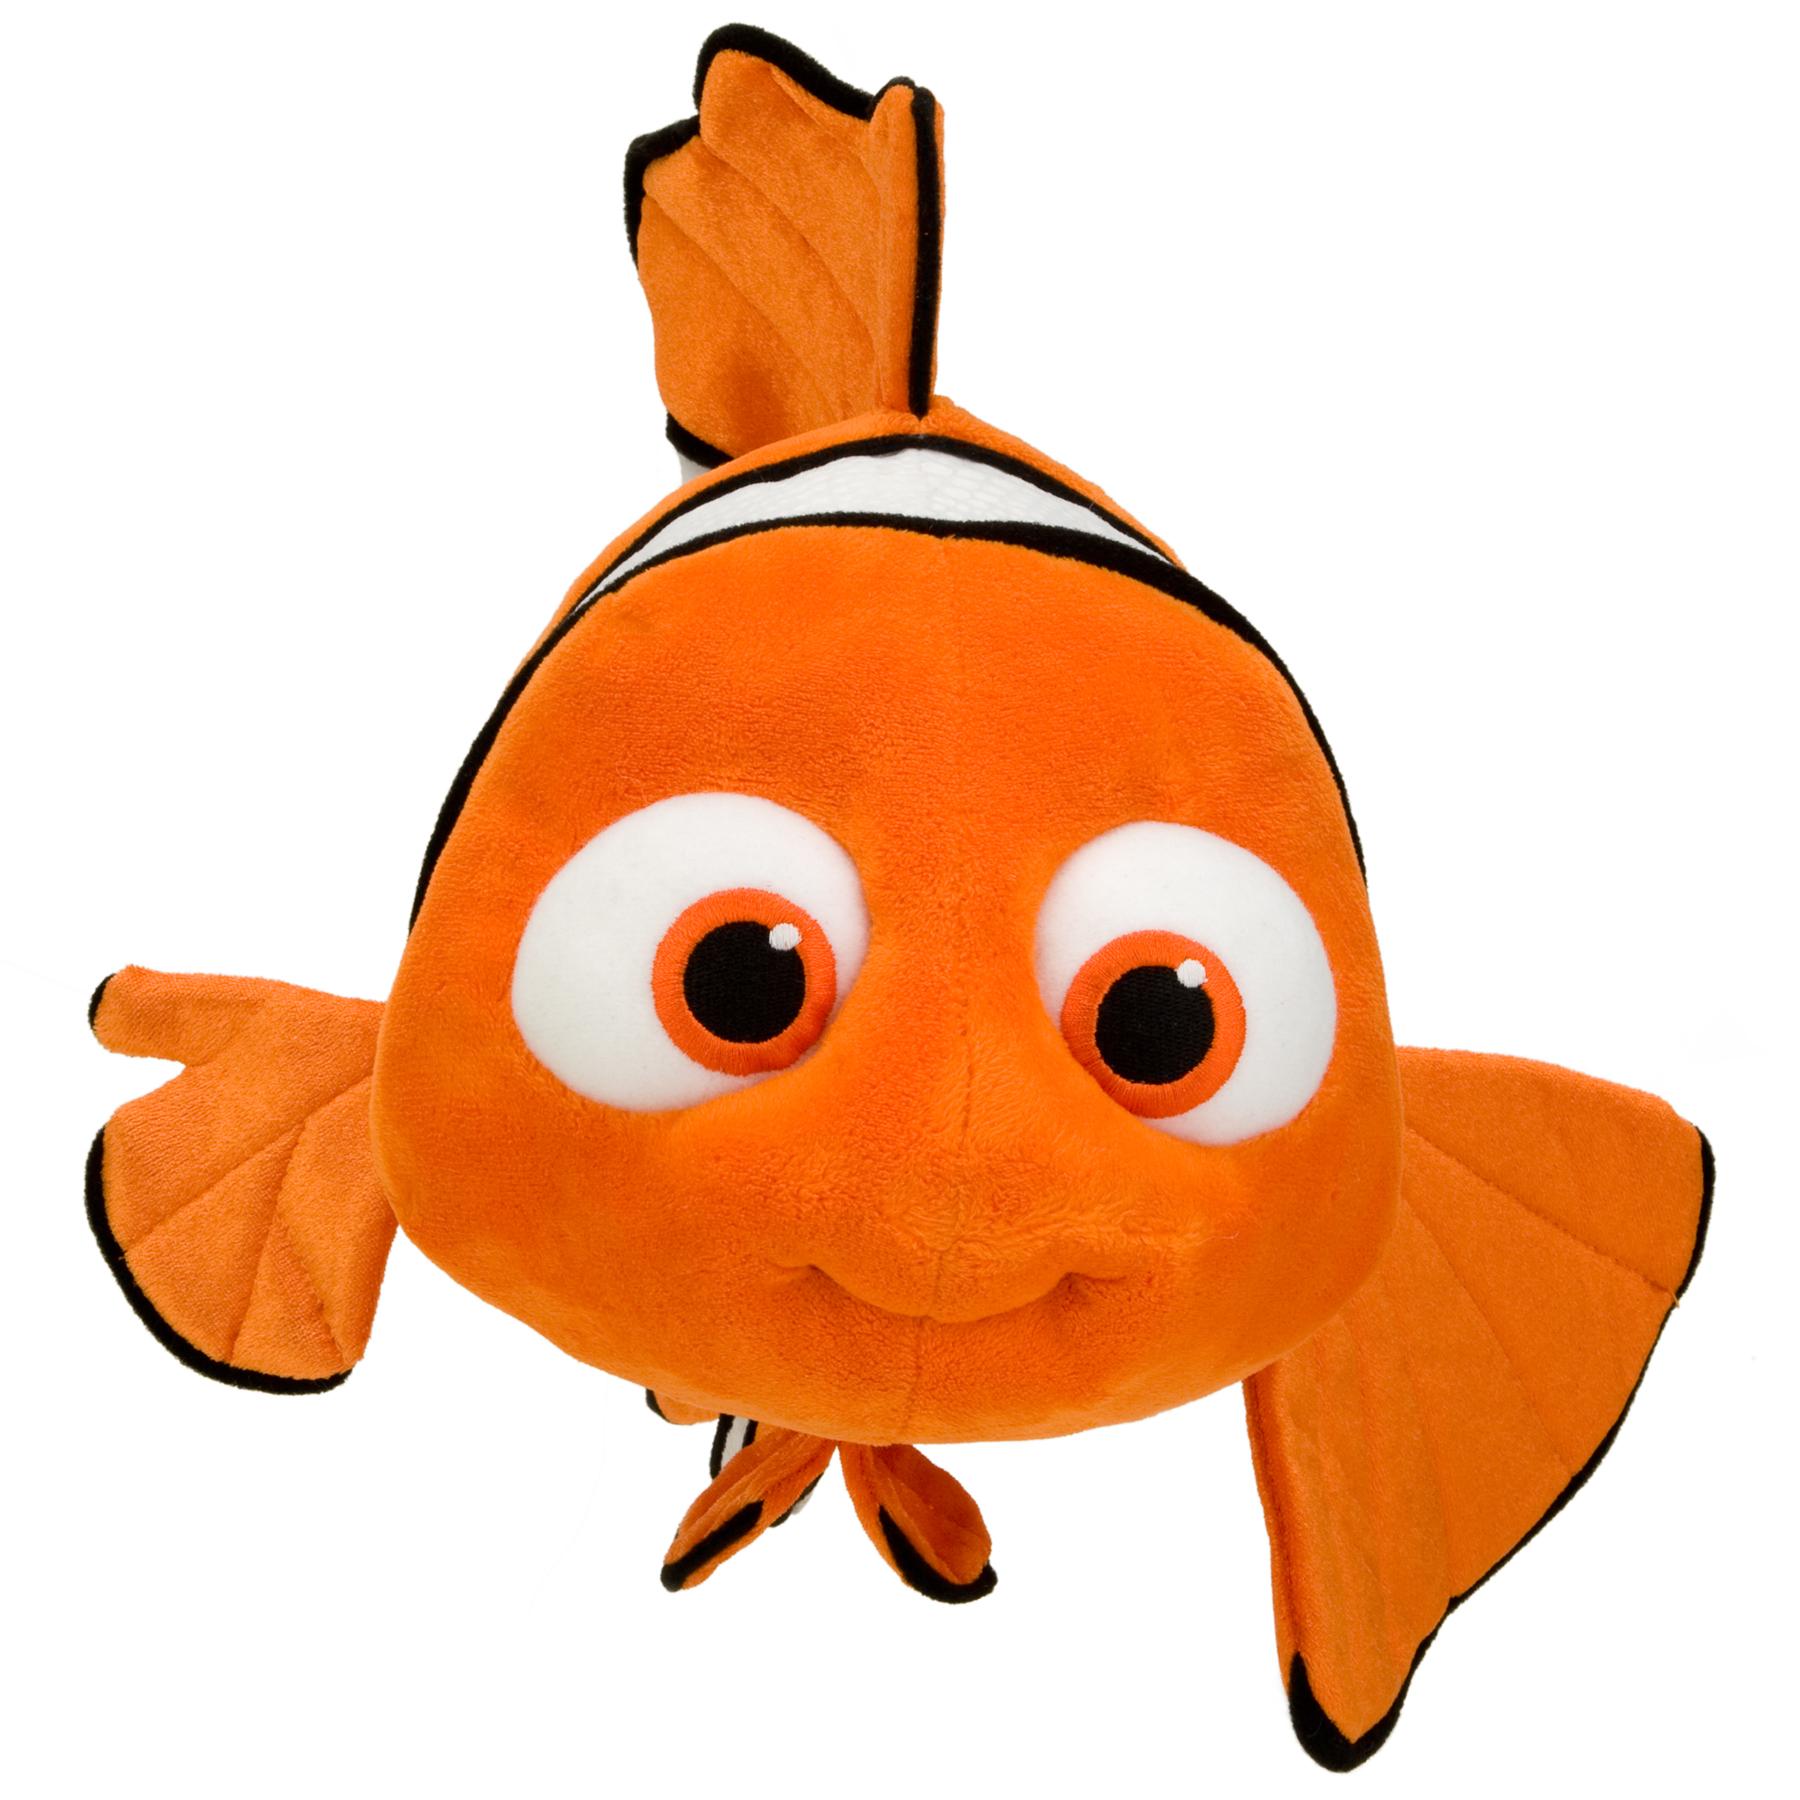 1800x1800 Top 73 Nemo Clip Art